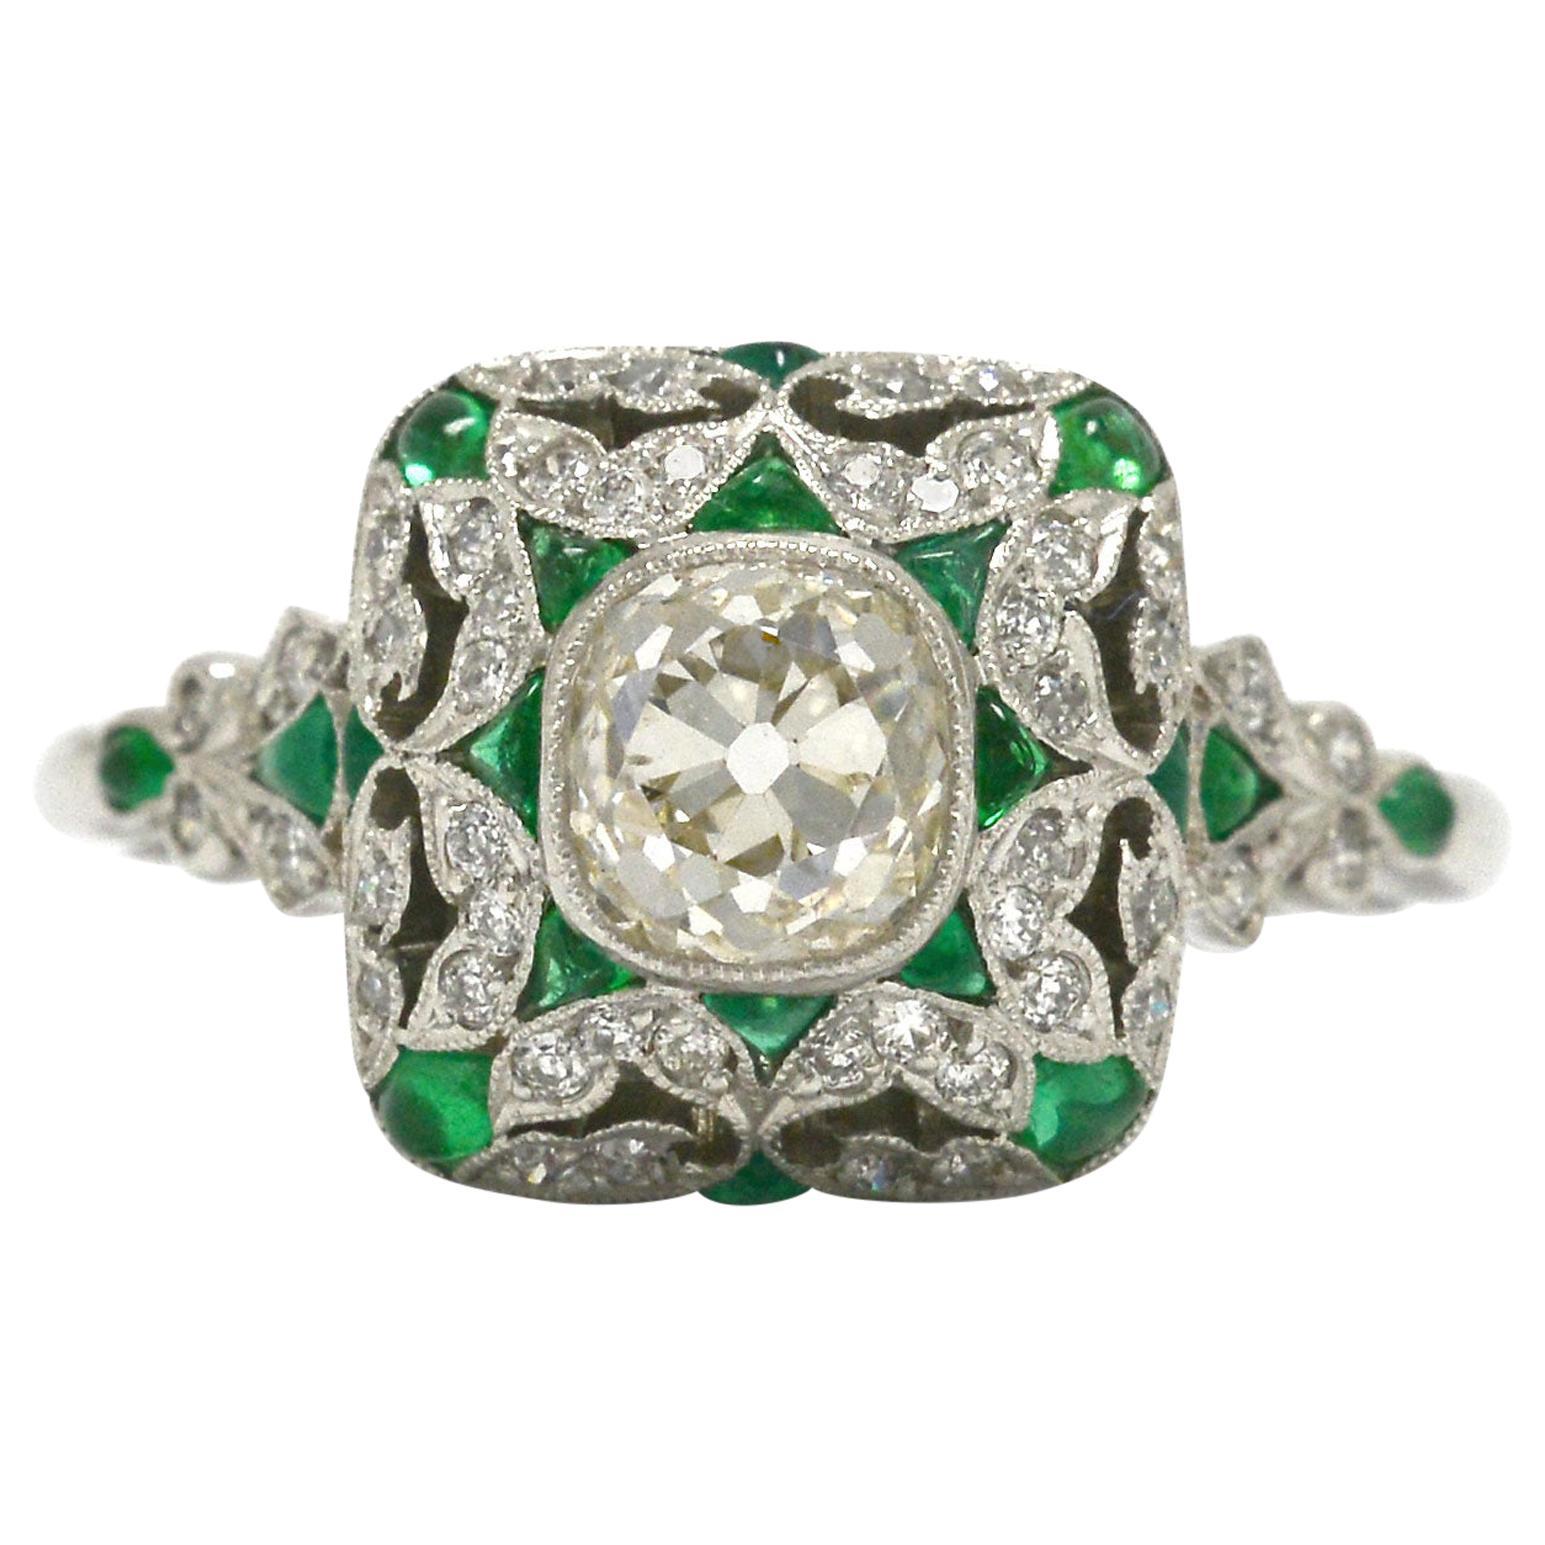 Art Deco Style Diamond Emerald Engagement Ring Old Mine Cut 1 Carat Cocktail